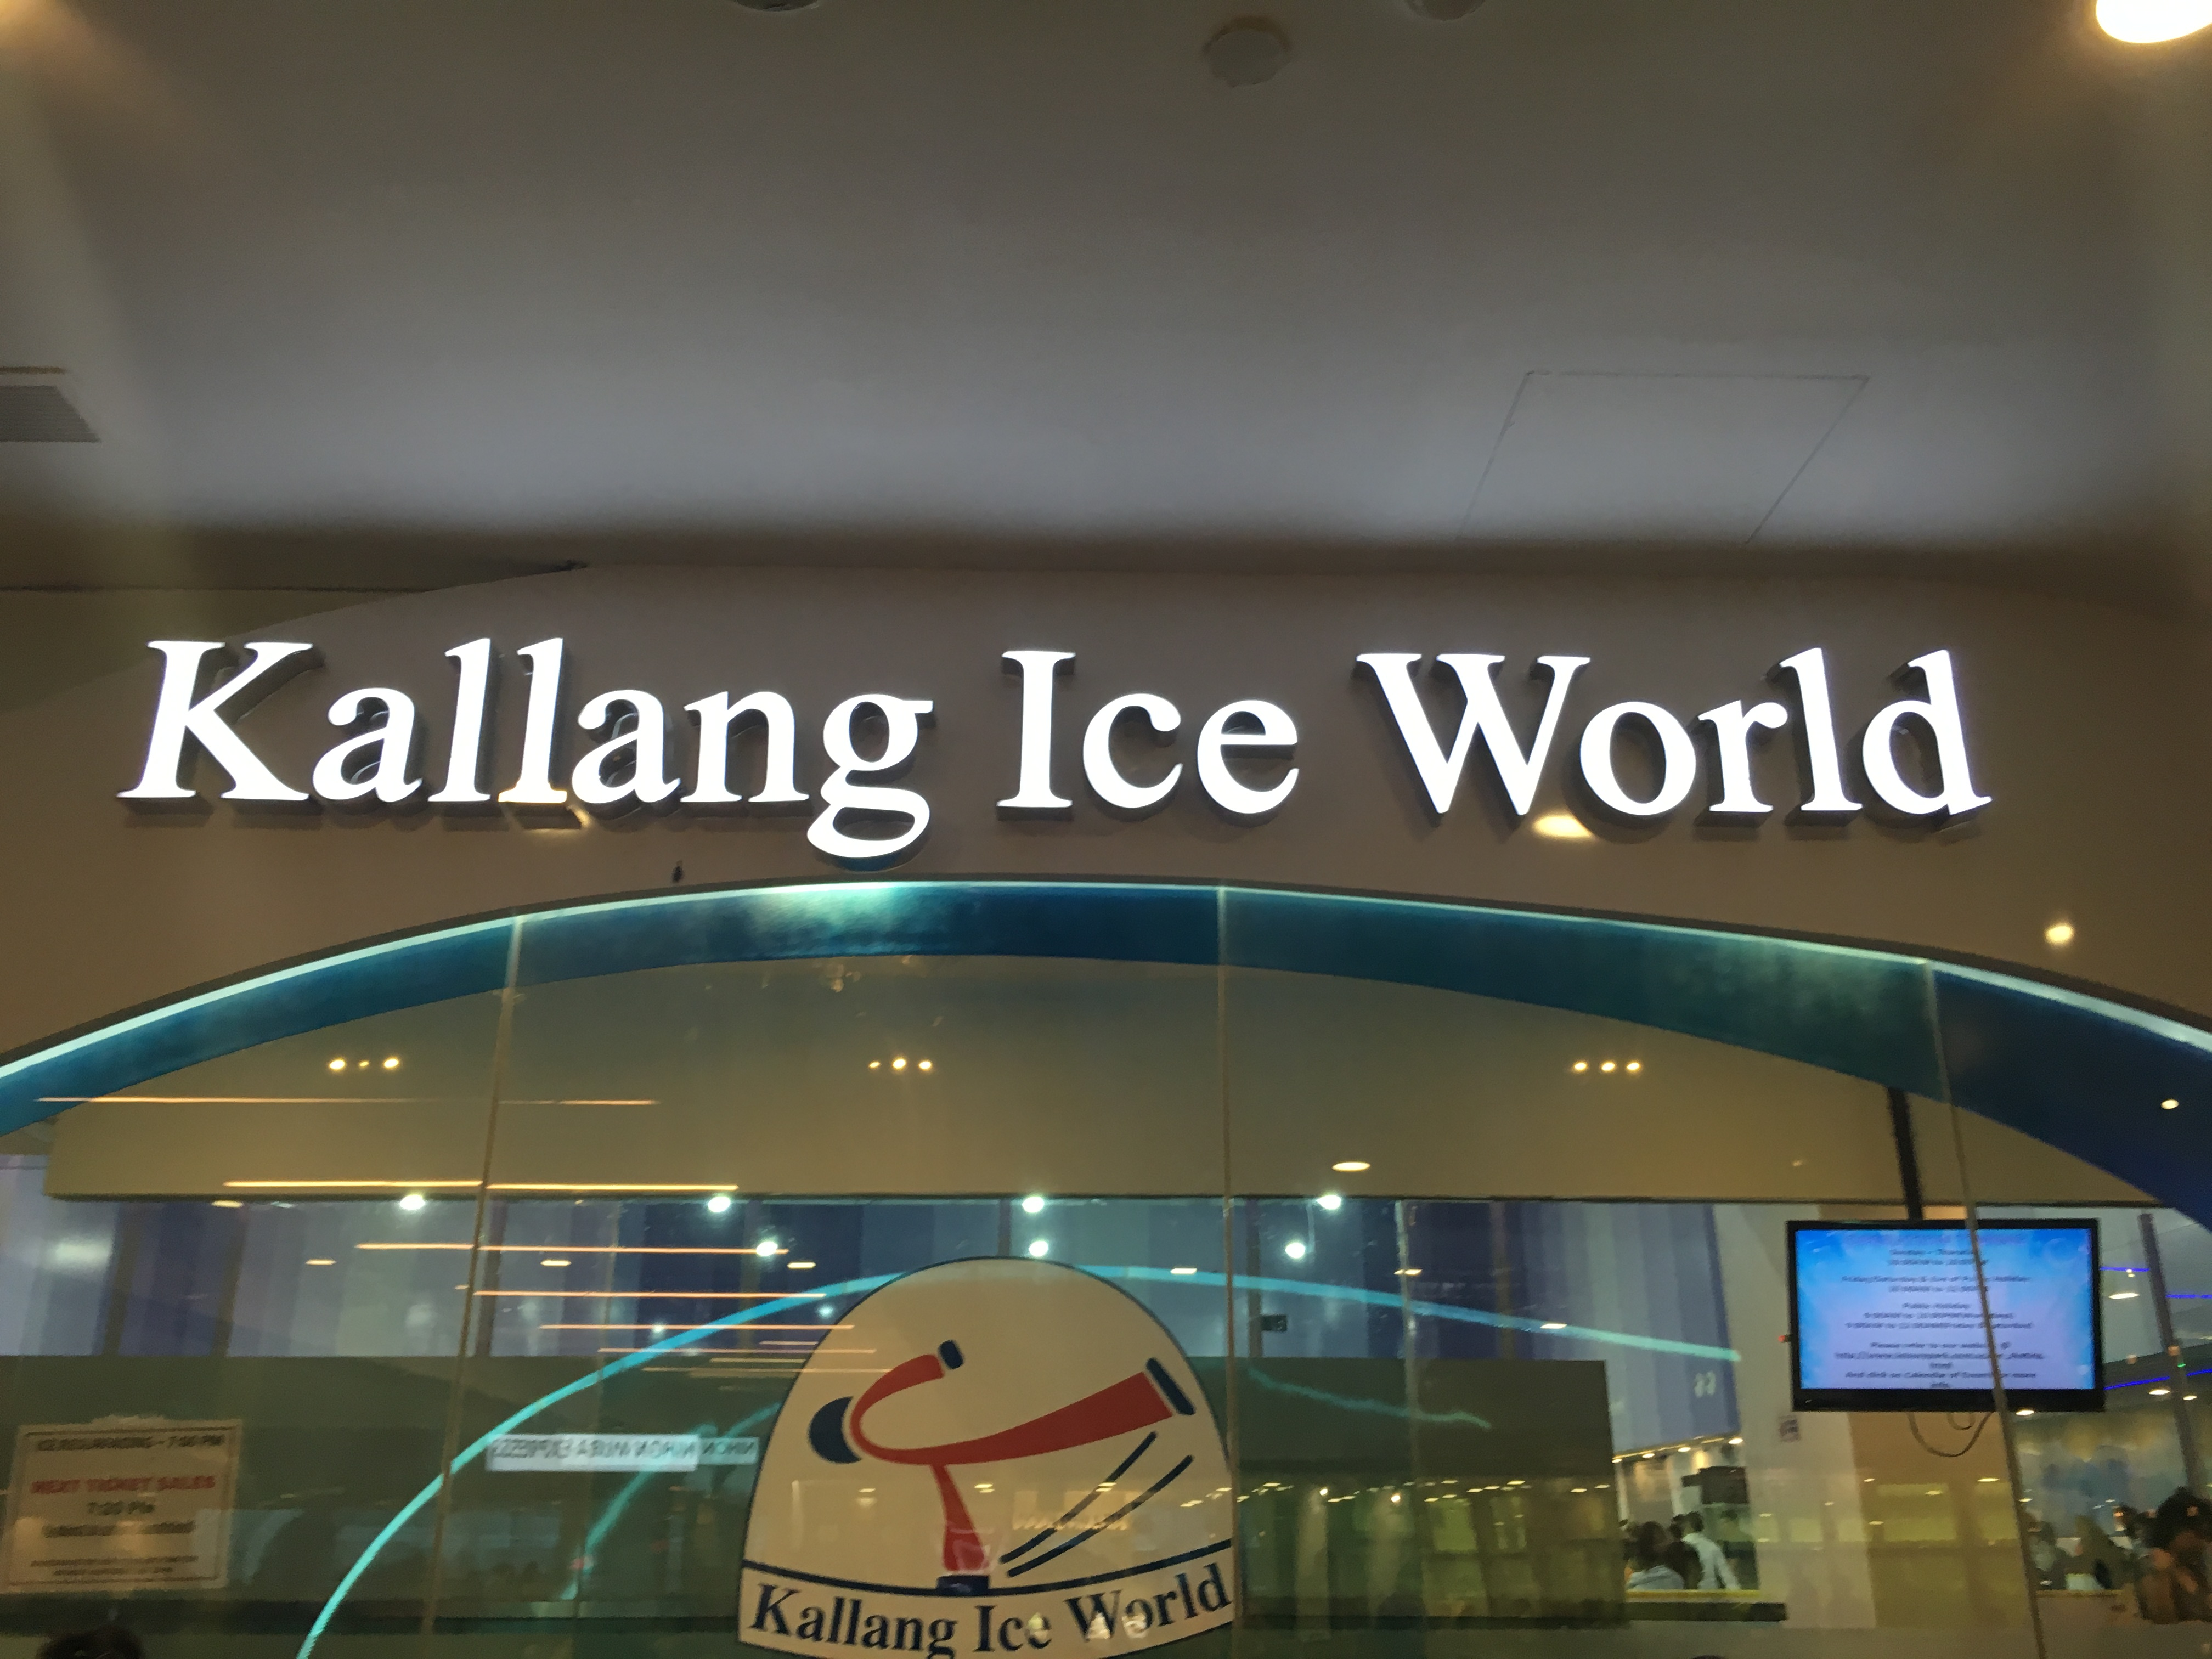 Kallang Ice World